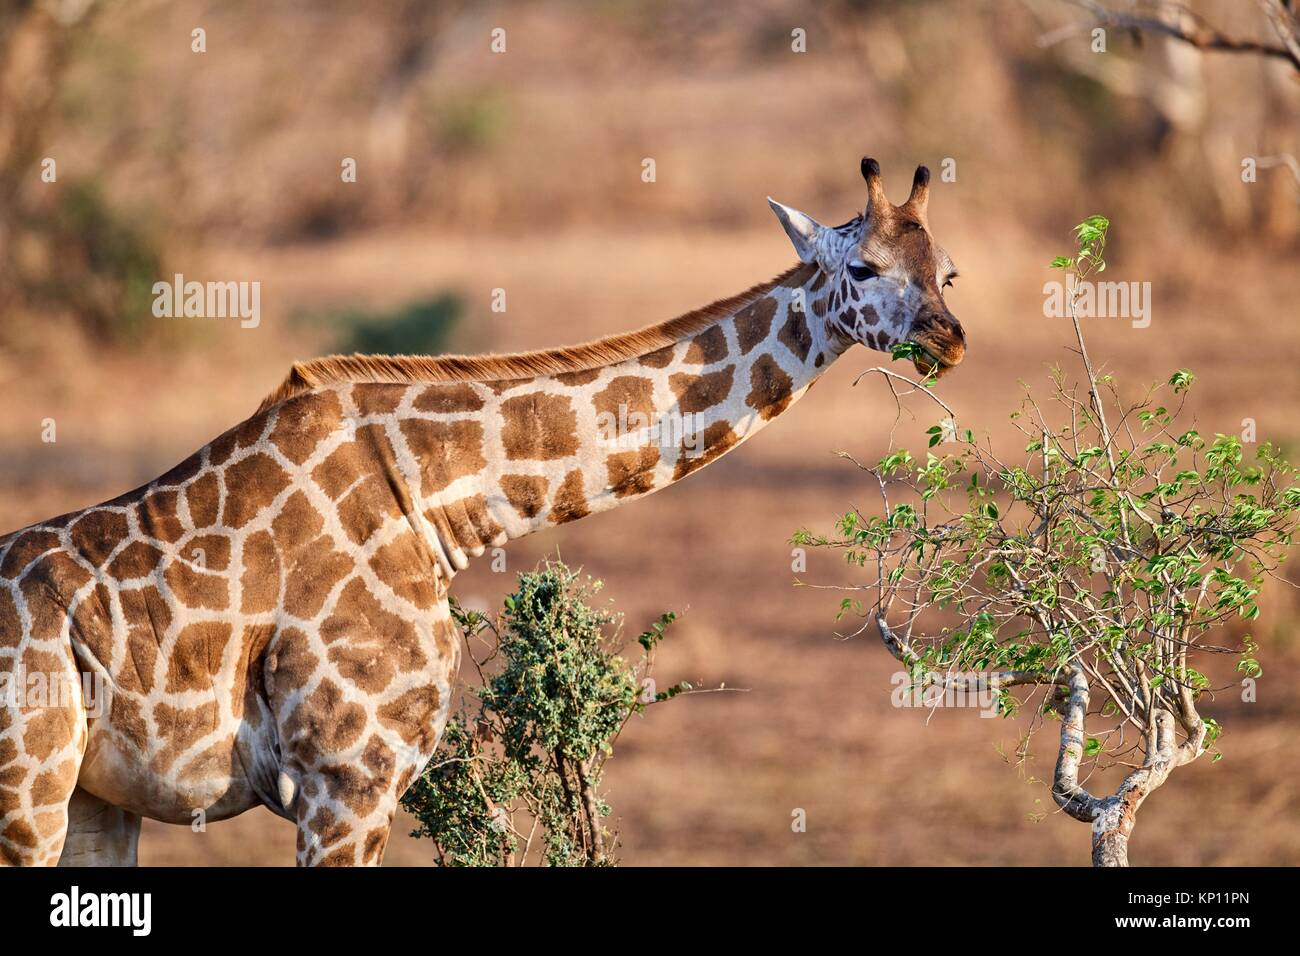 Rothschild's giraffe (Giraffa camelopardalis rothschildi) feeding on acacia tree in Murchisson Falls National - Stock Image